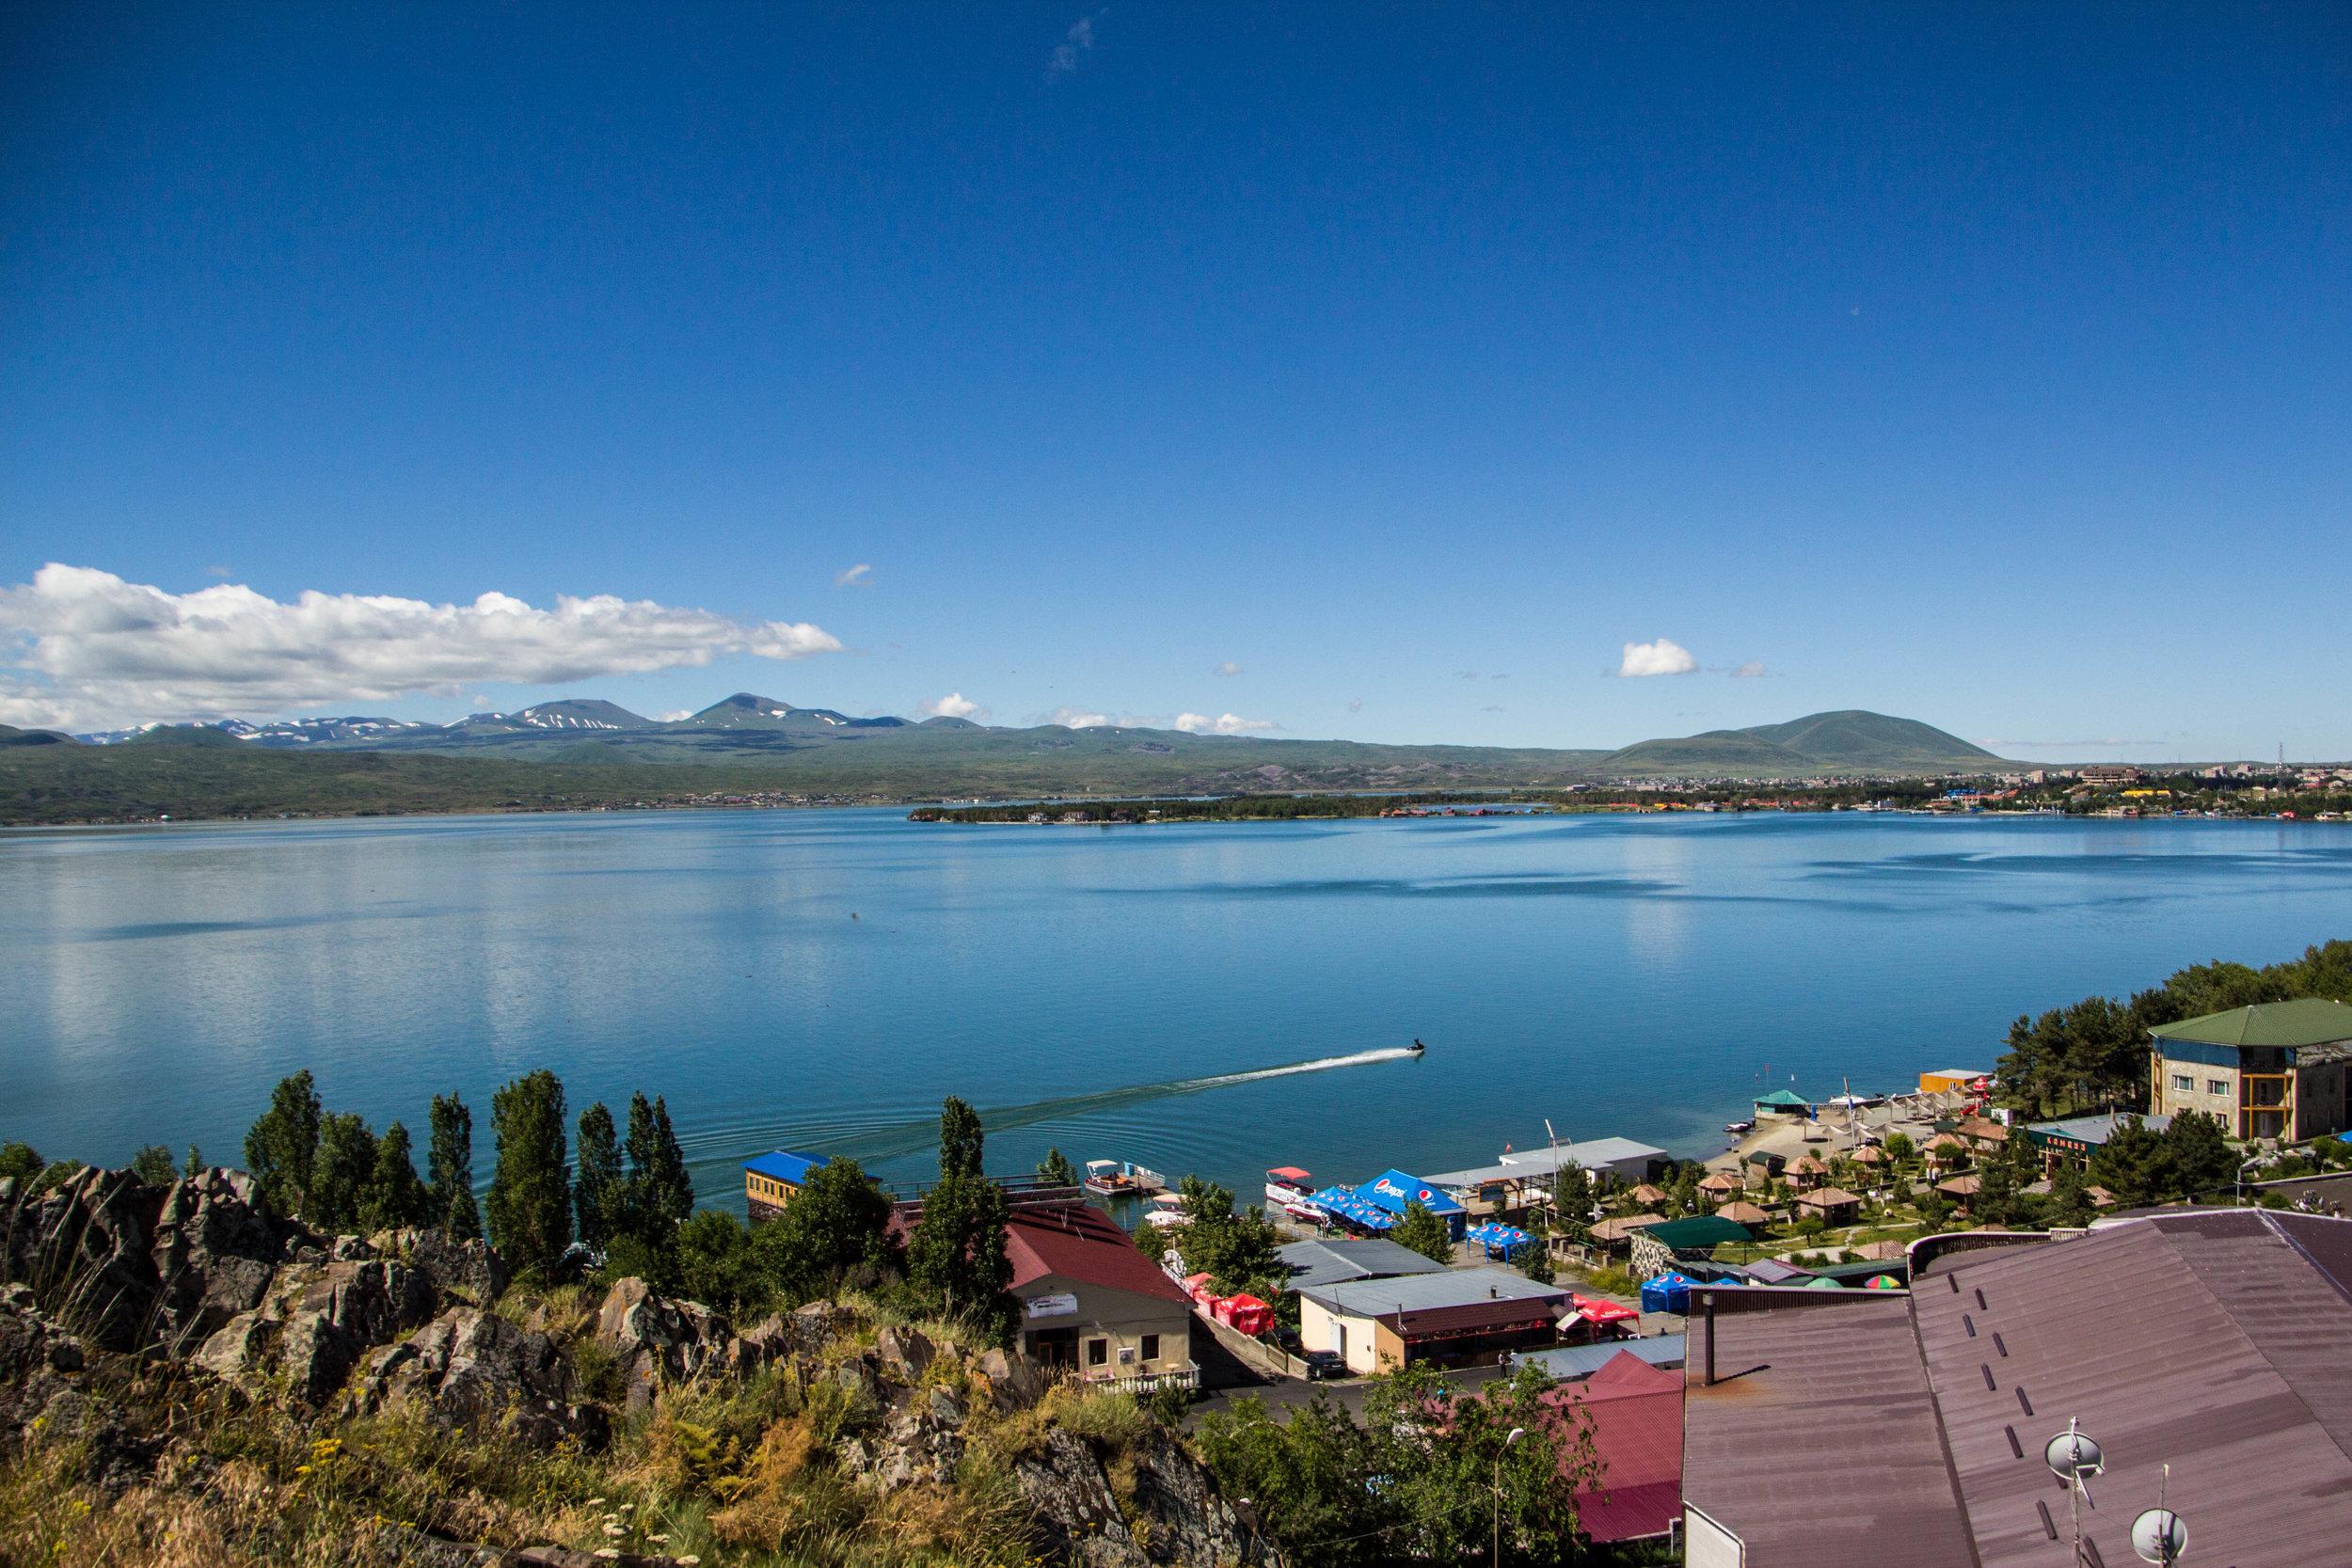 sevanavank-lake-sevan-armenia.jpg